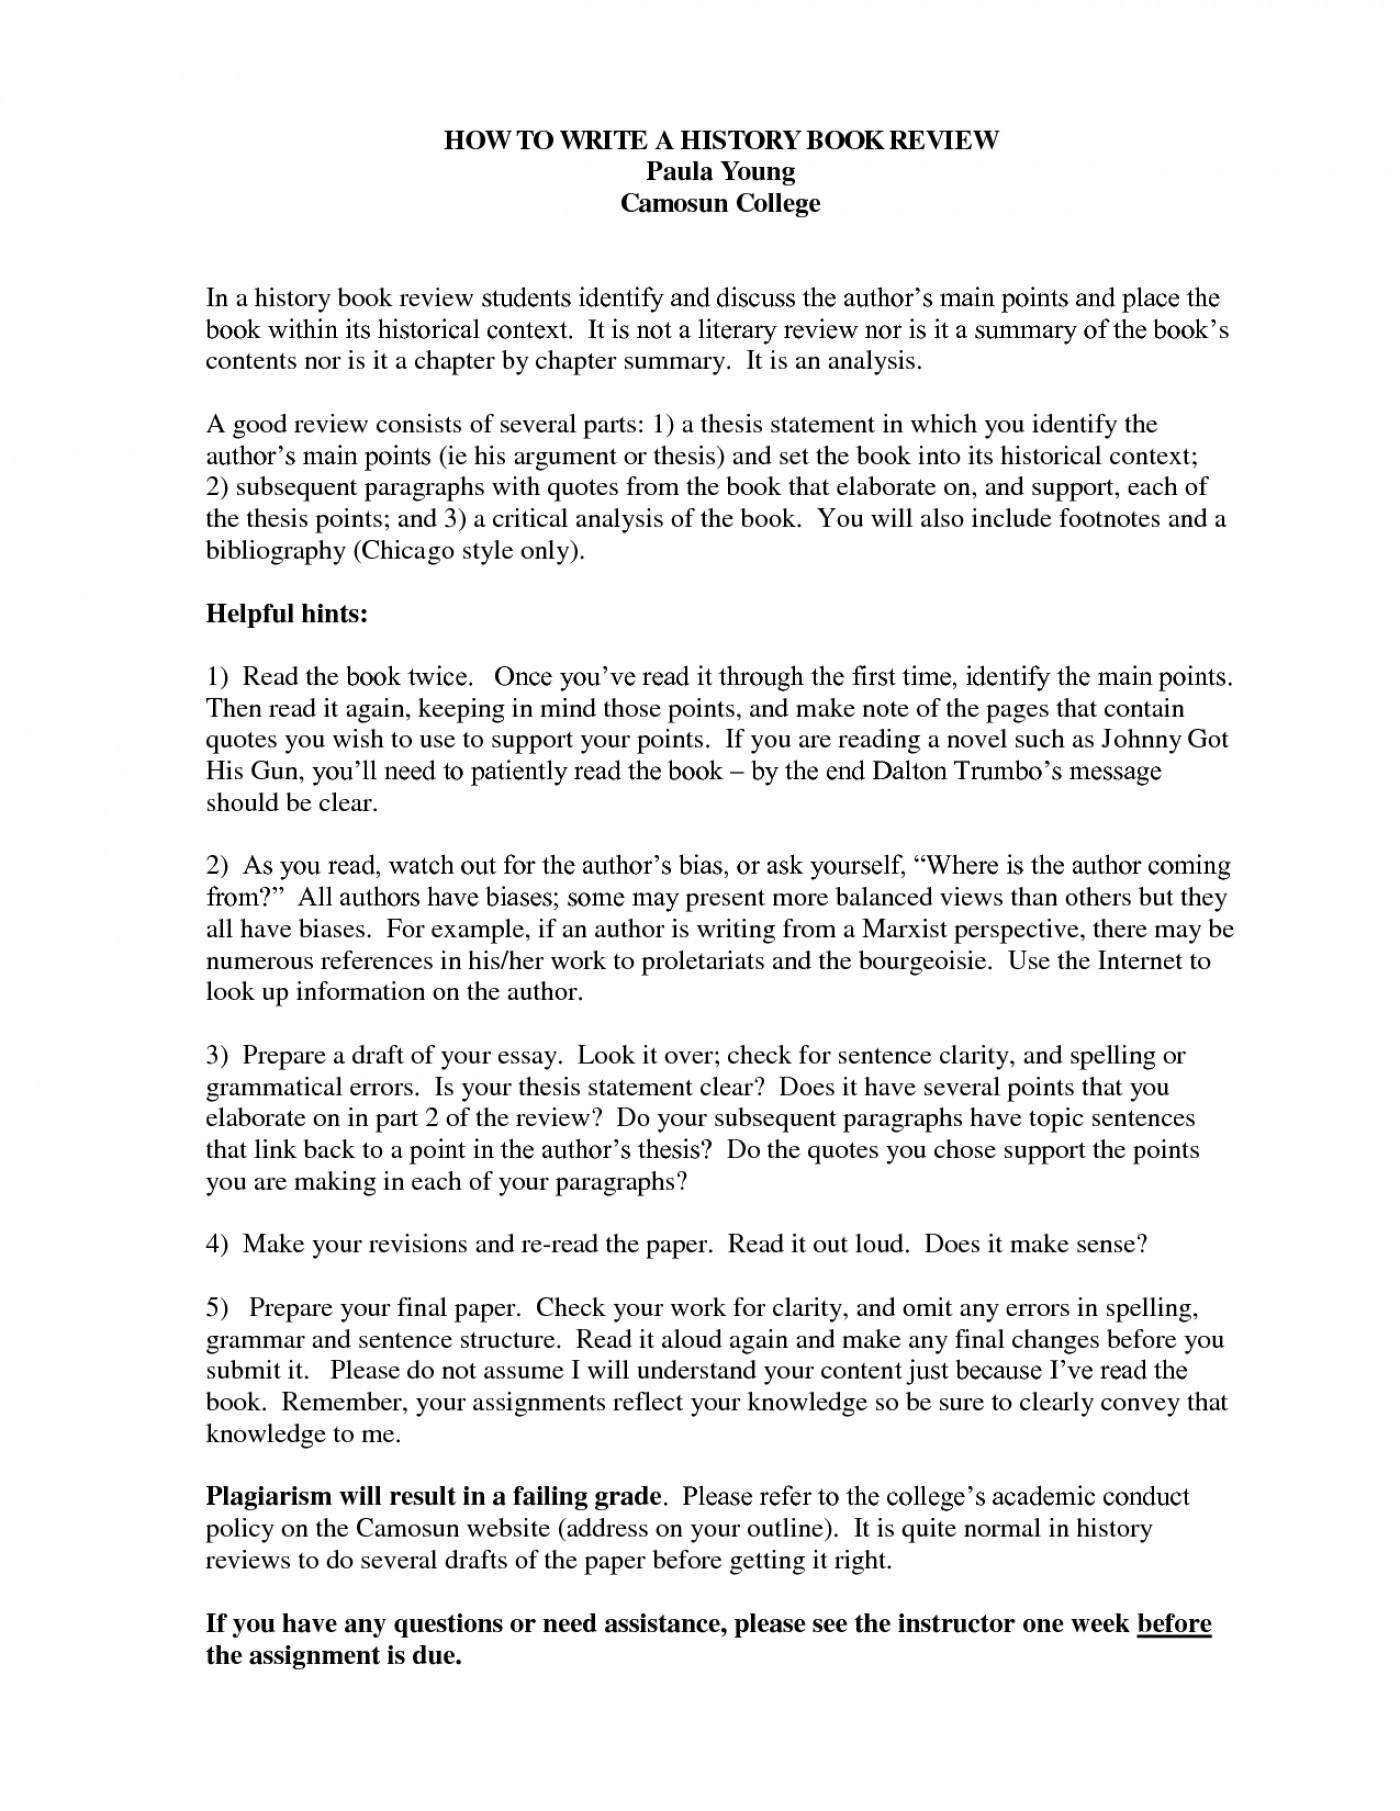 Essay about telemedicine